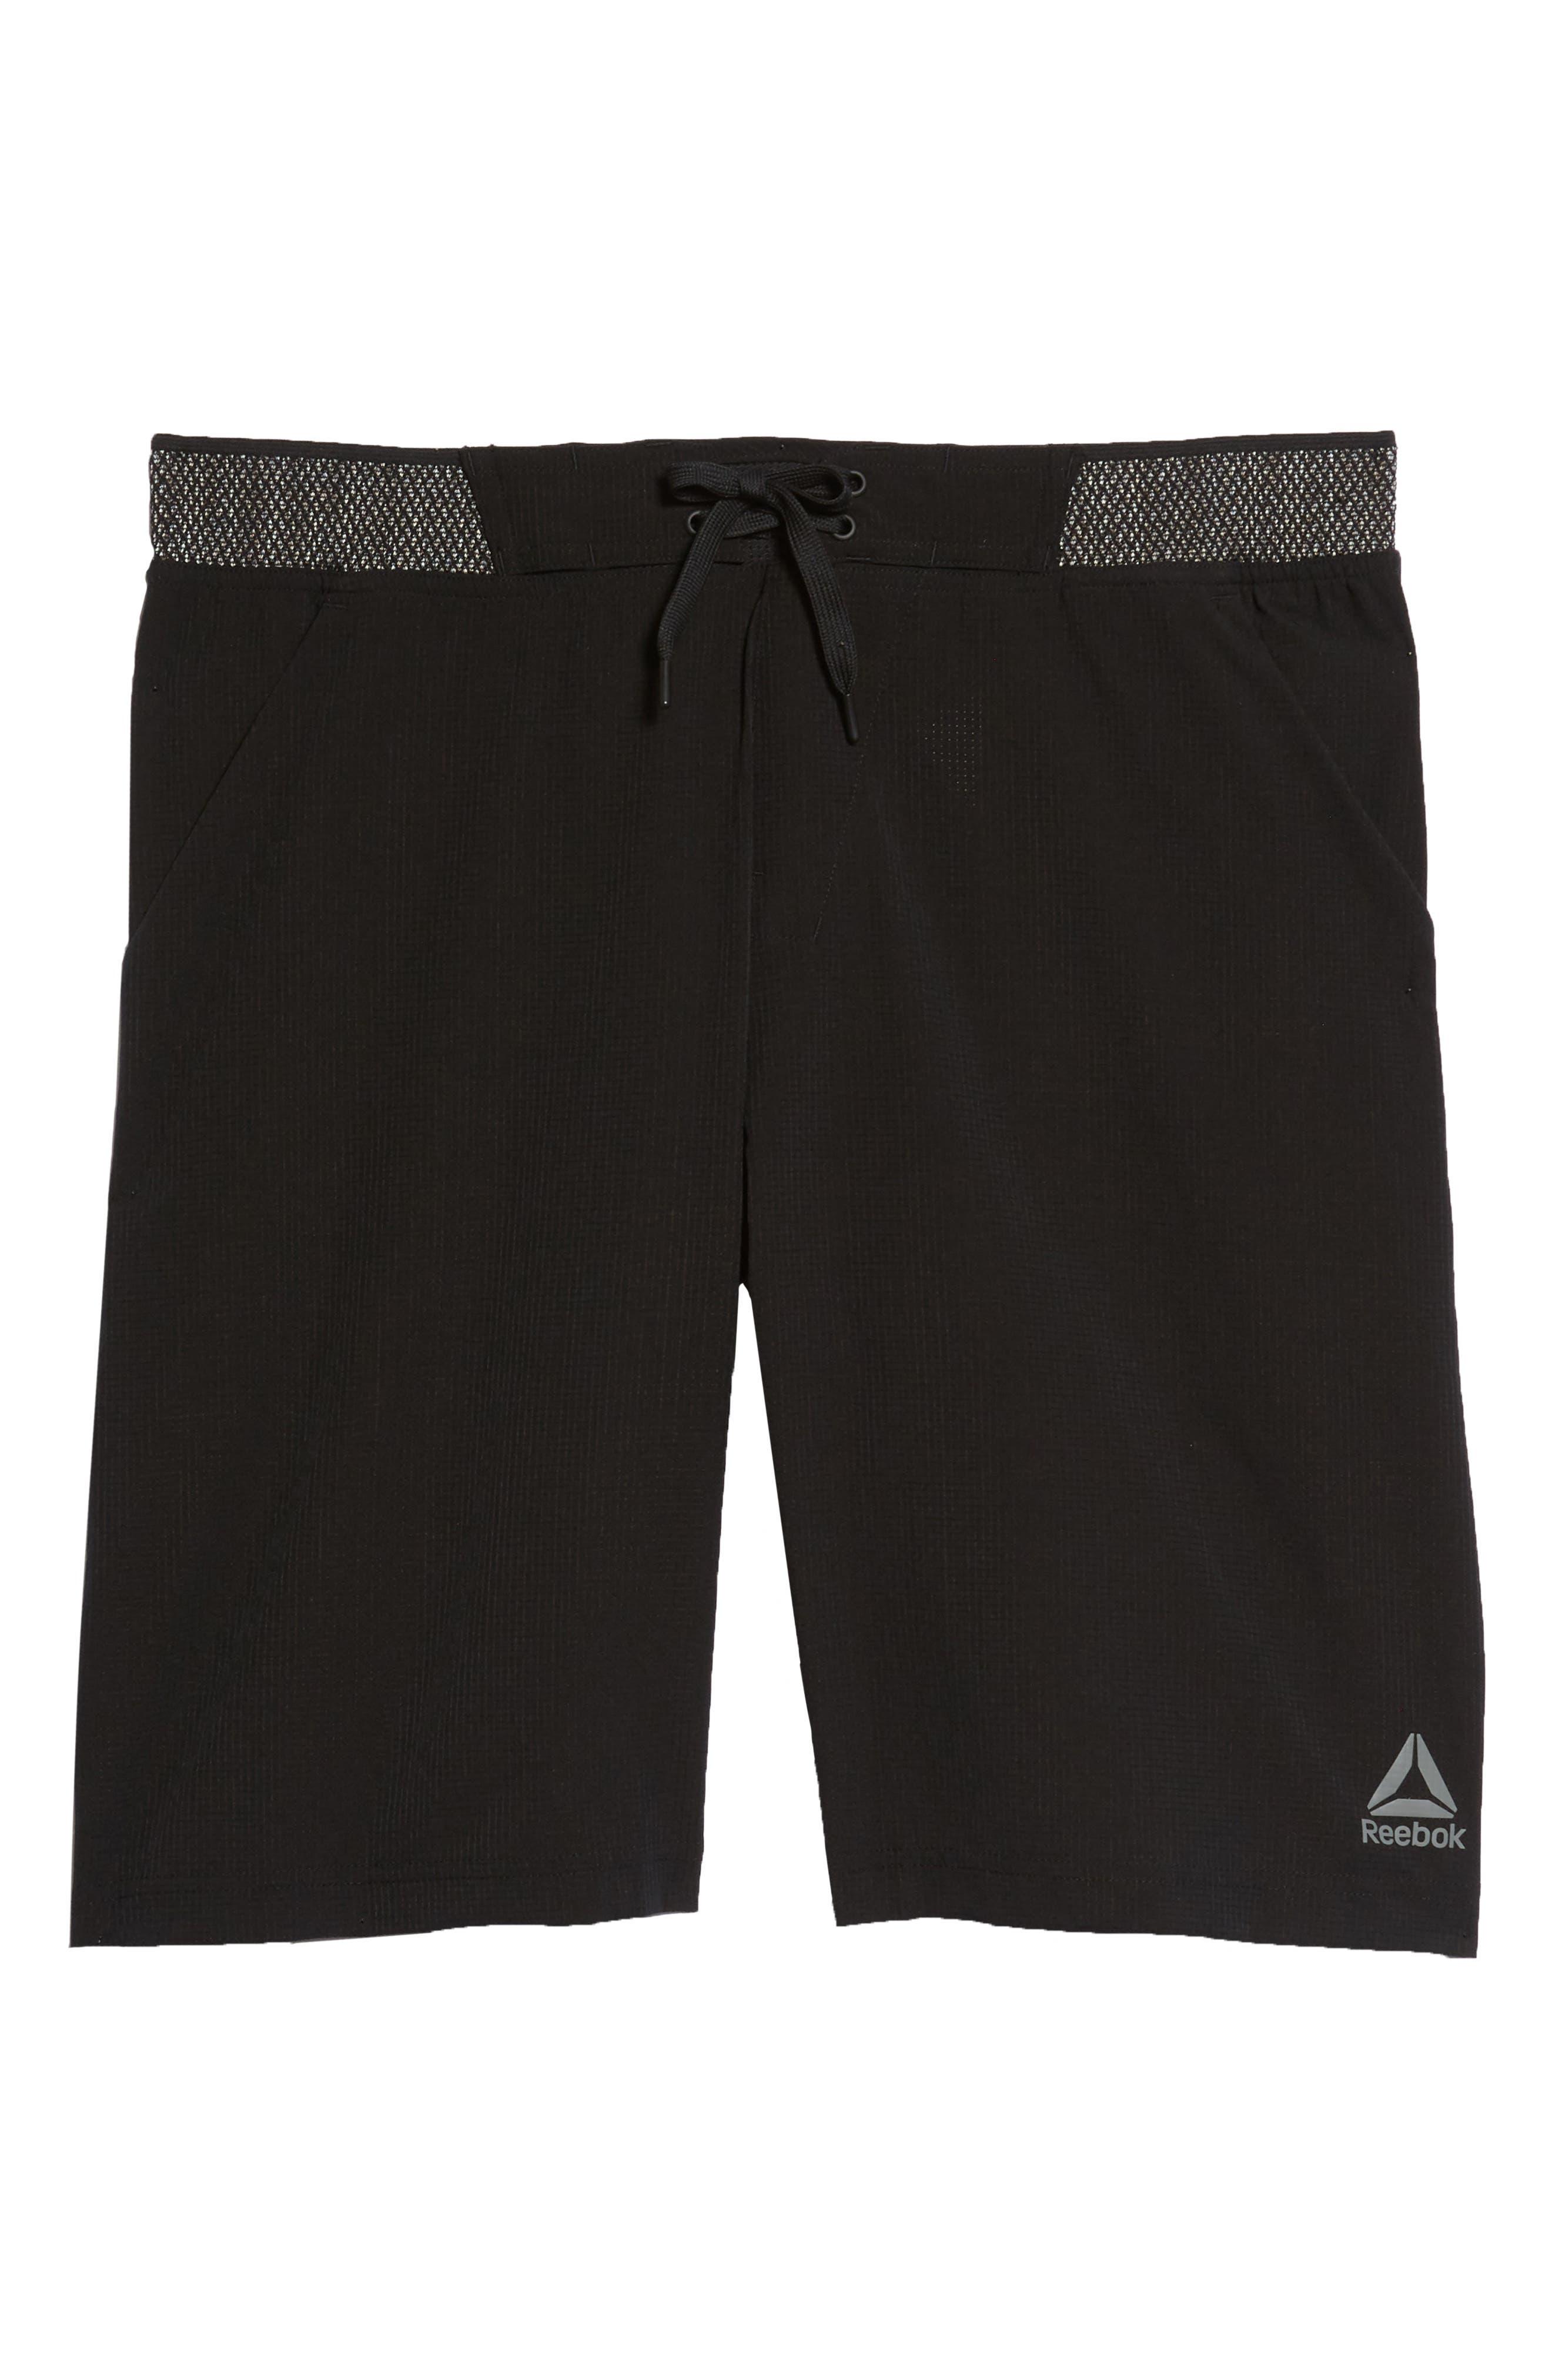 Epic Knit Shorts,                             Alternate thumbnail 6, color,                             005